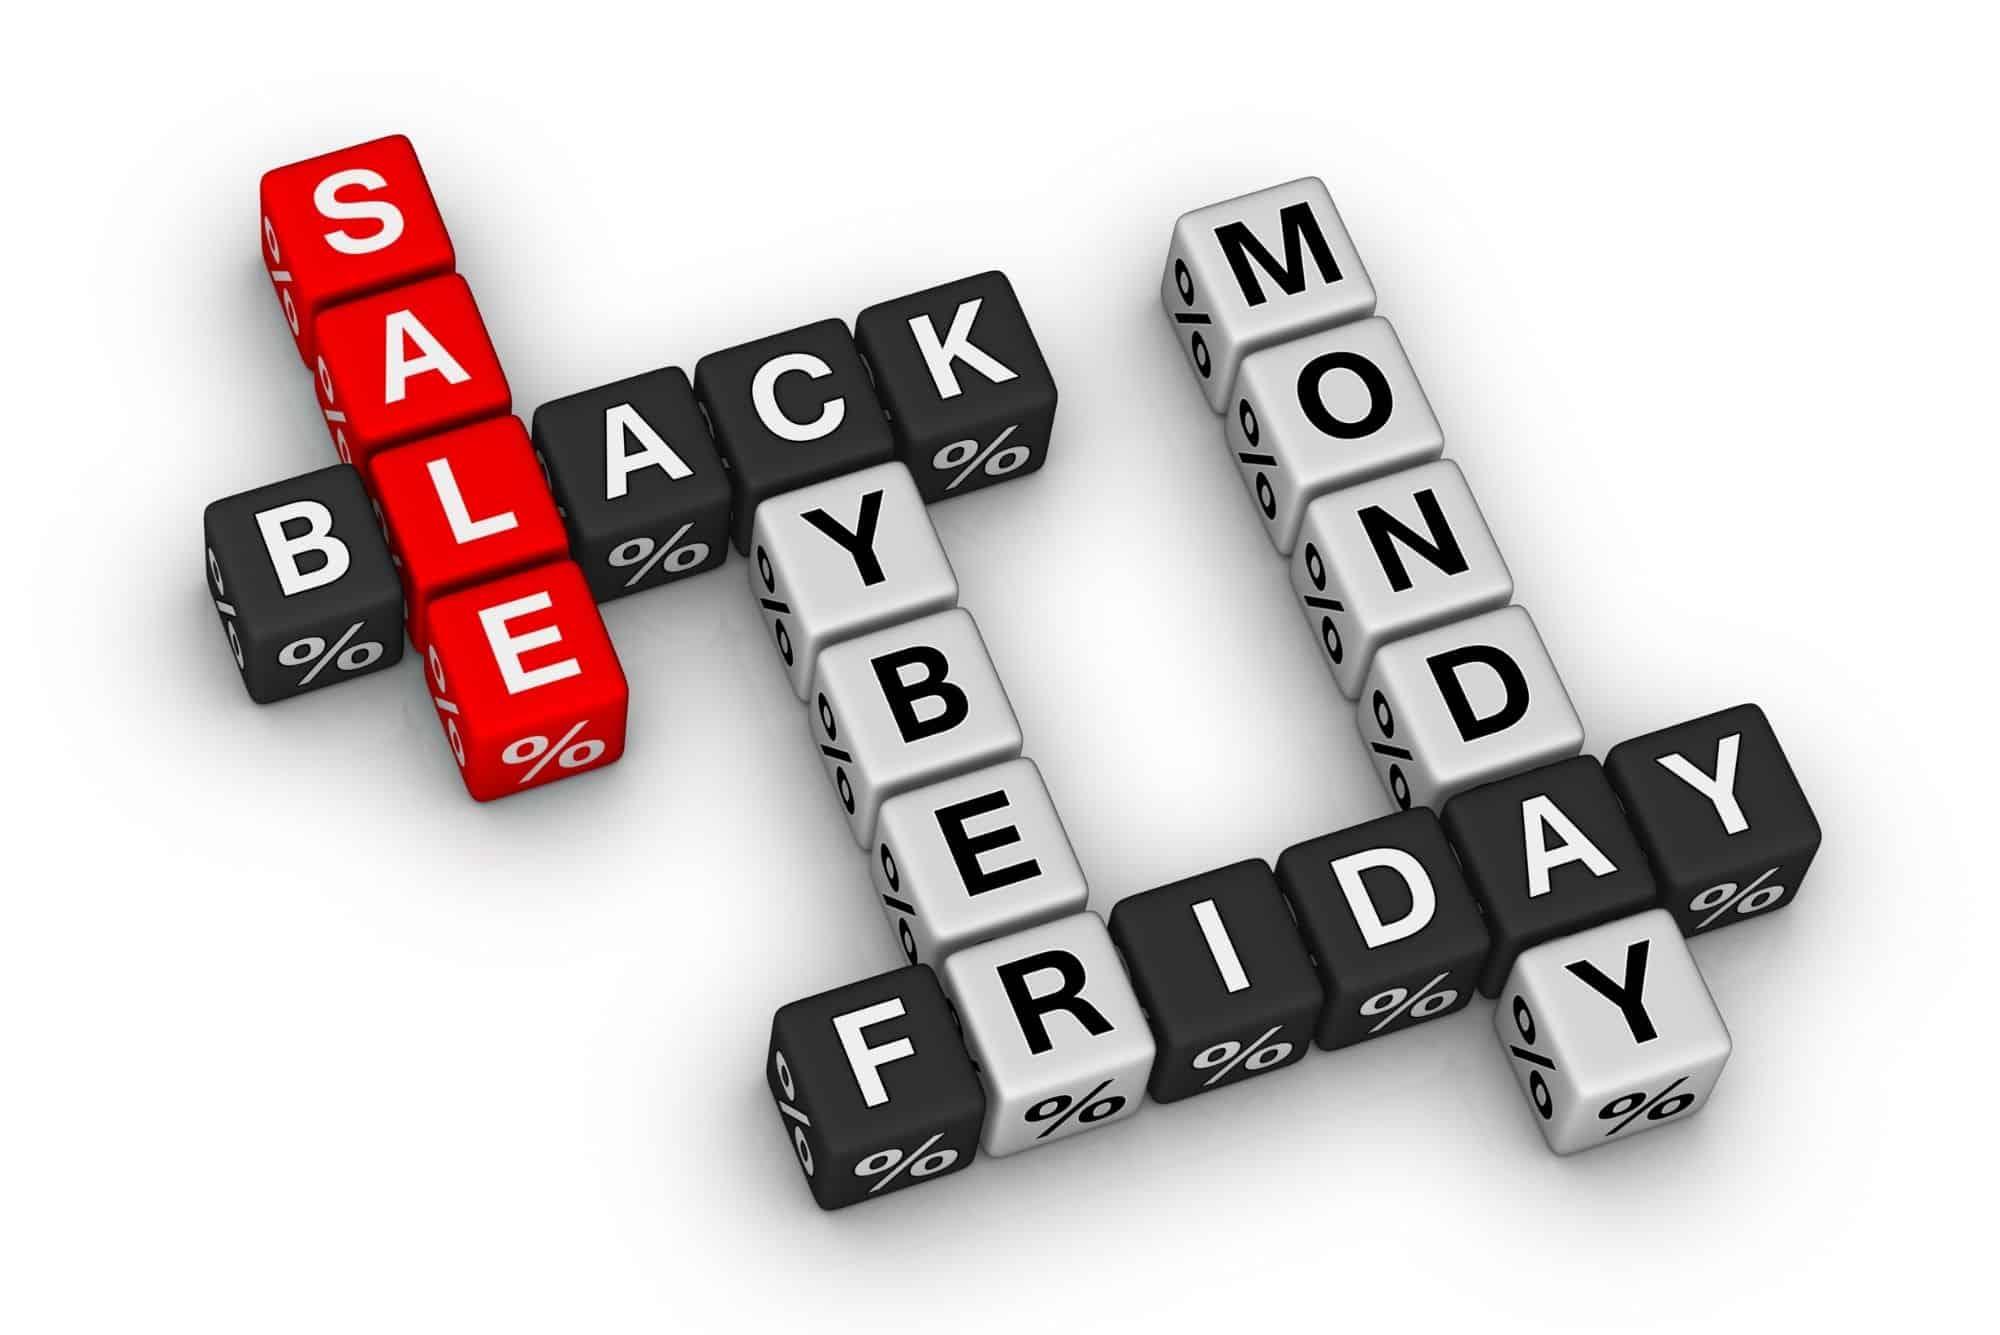 black friday cyber Monday crossword blocks